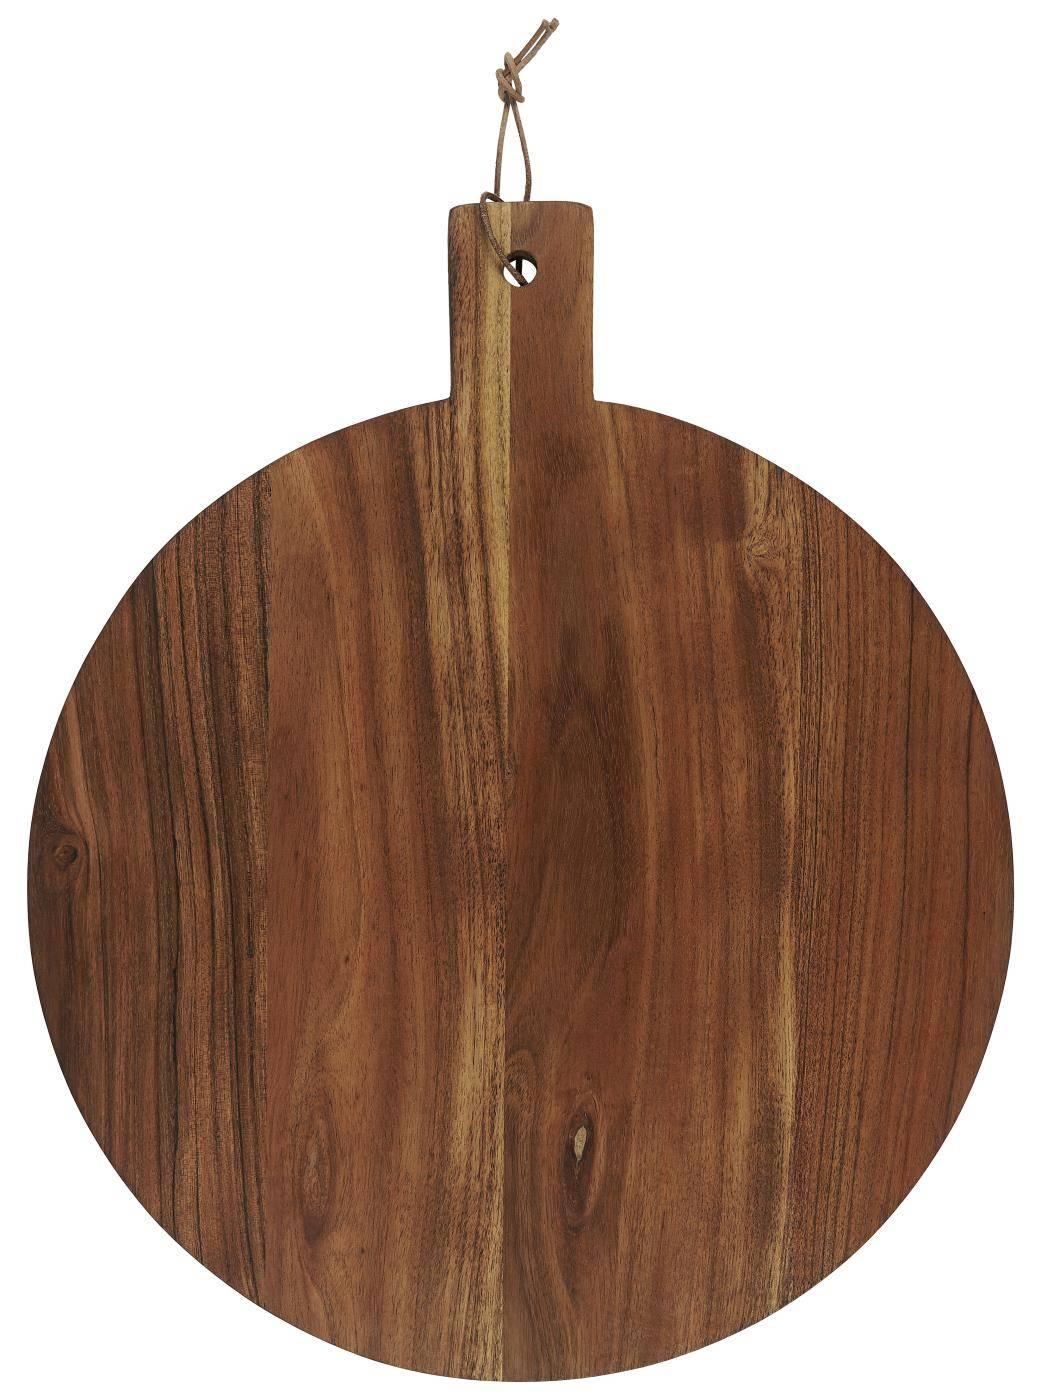 IB LAURSEN Dřevěné prkénko Round Oiled Acacia, hnědá barva, dřevo